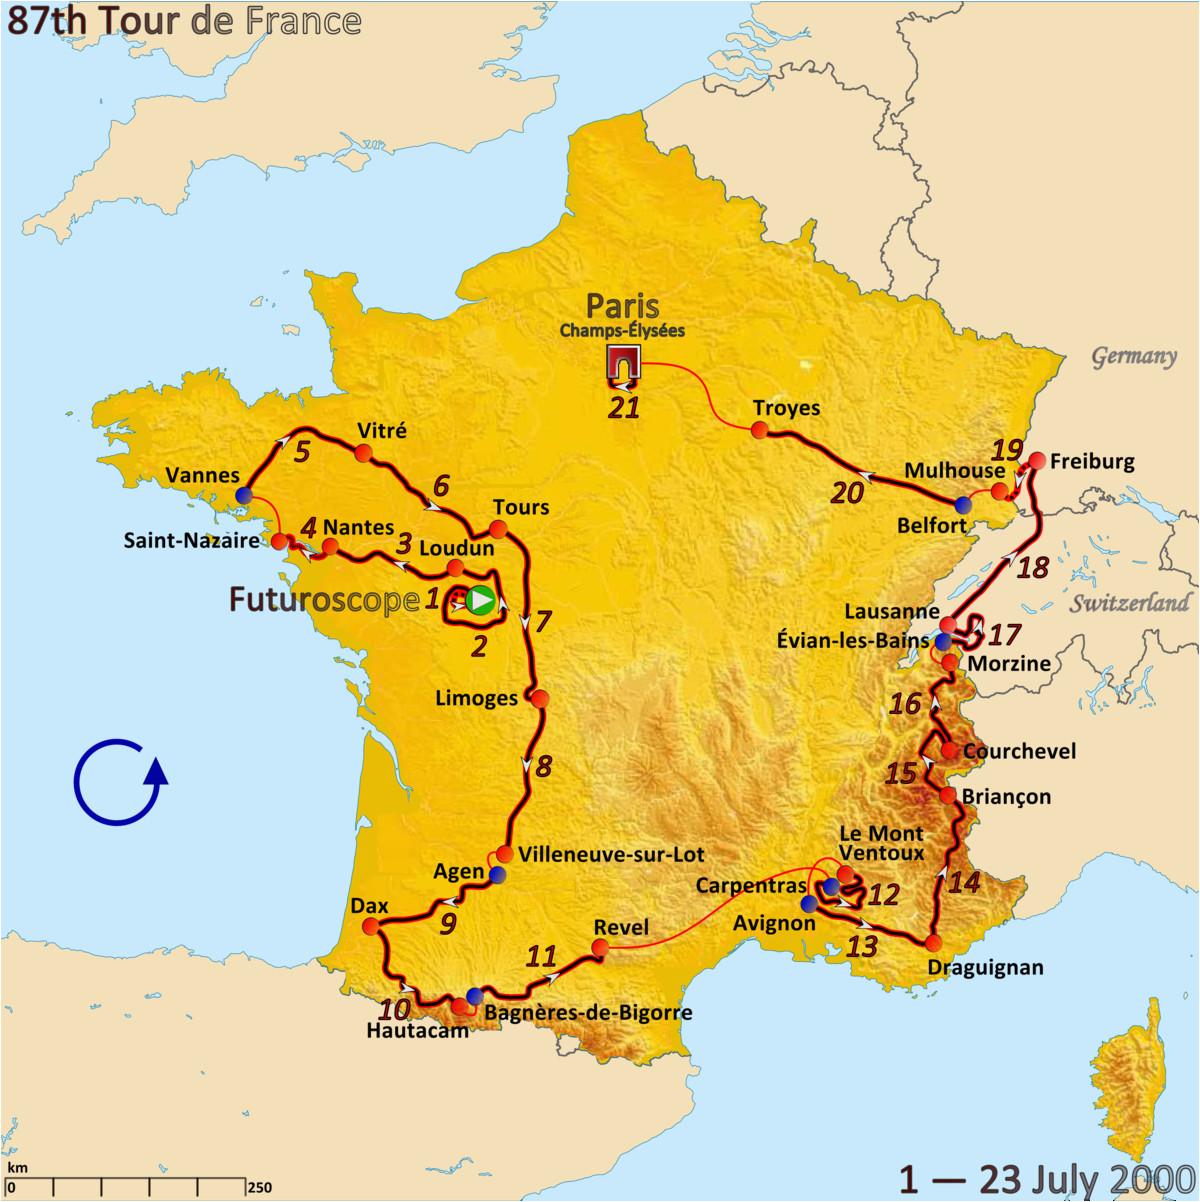 tour de france 2000 wikipedia wolna encyklopedia